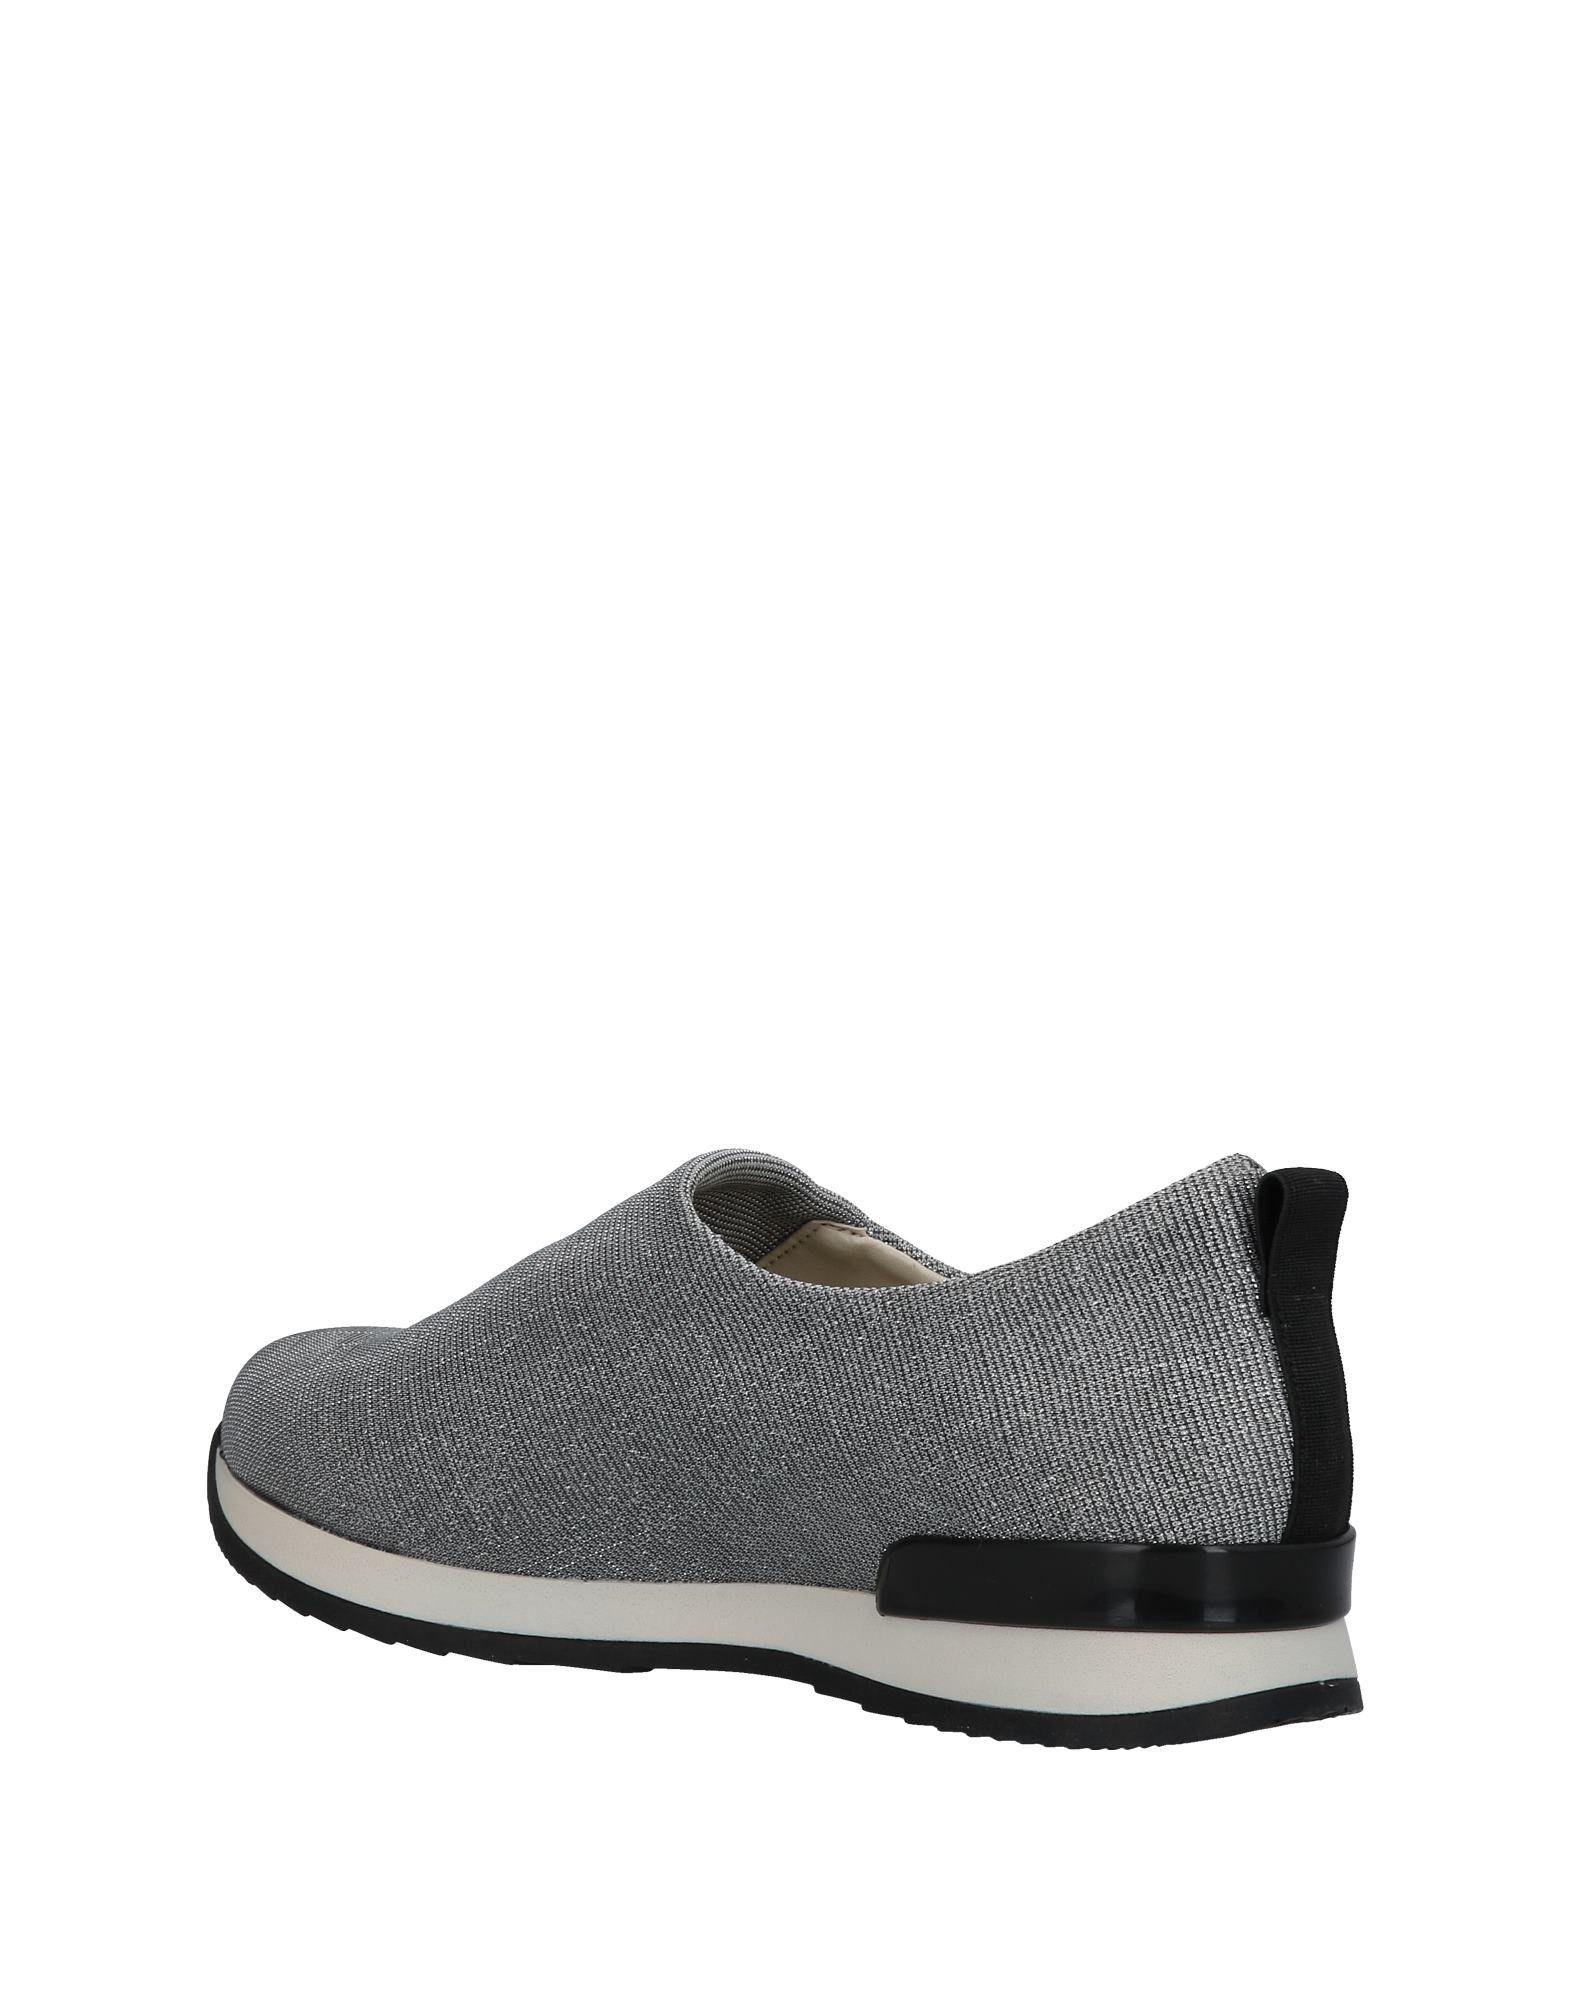 Nr Rapisardi Sneakers Damen beliebte  11419290AB Gute Qualität beliebte Damen Schuhe 16de79